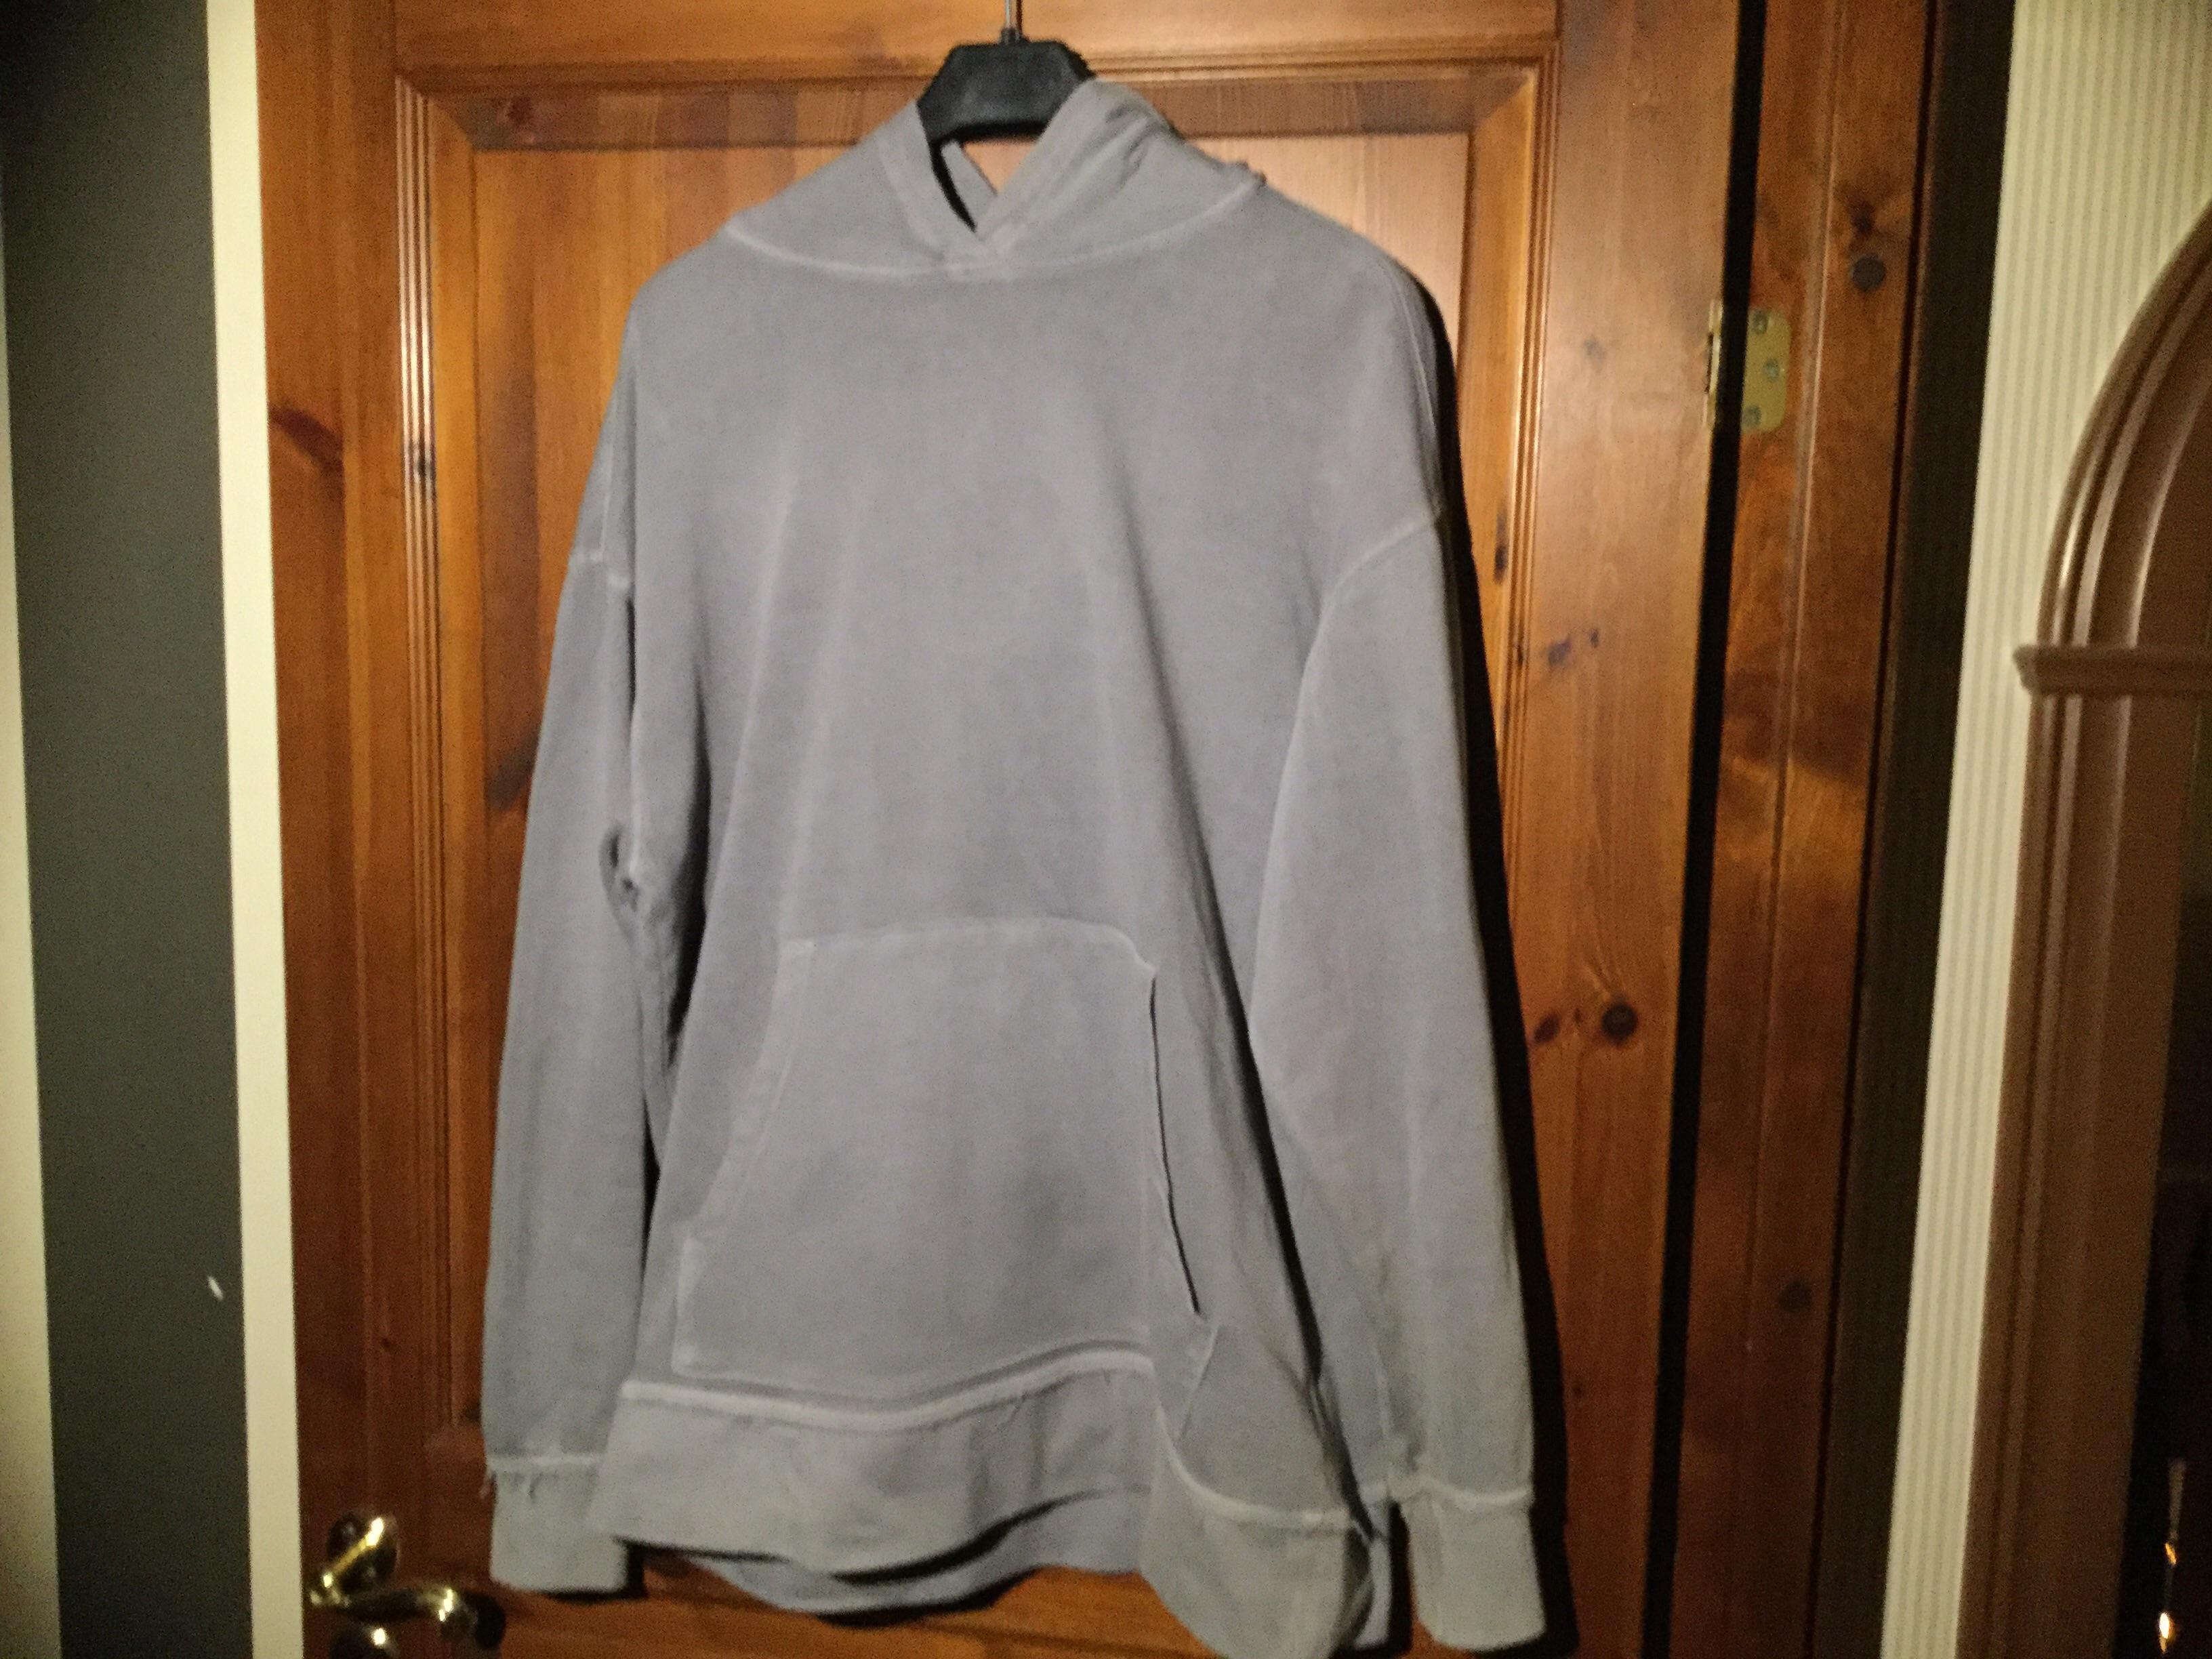 H&M Yeezy hoodie replica